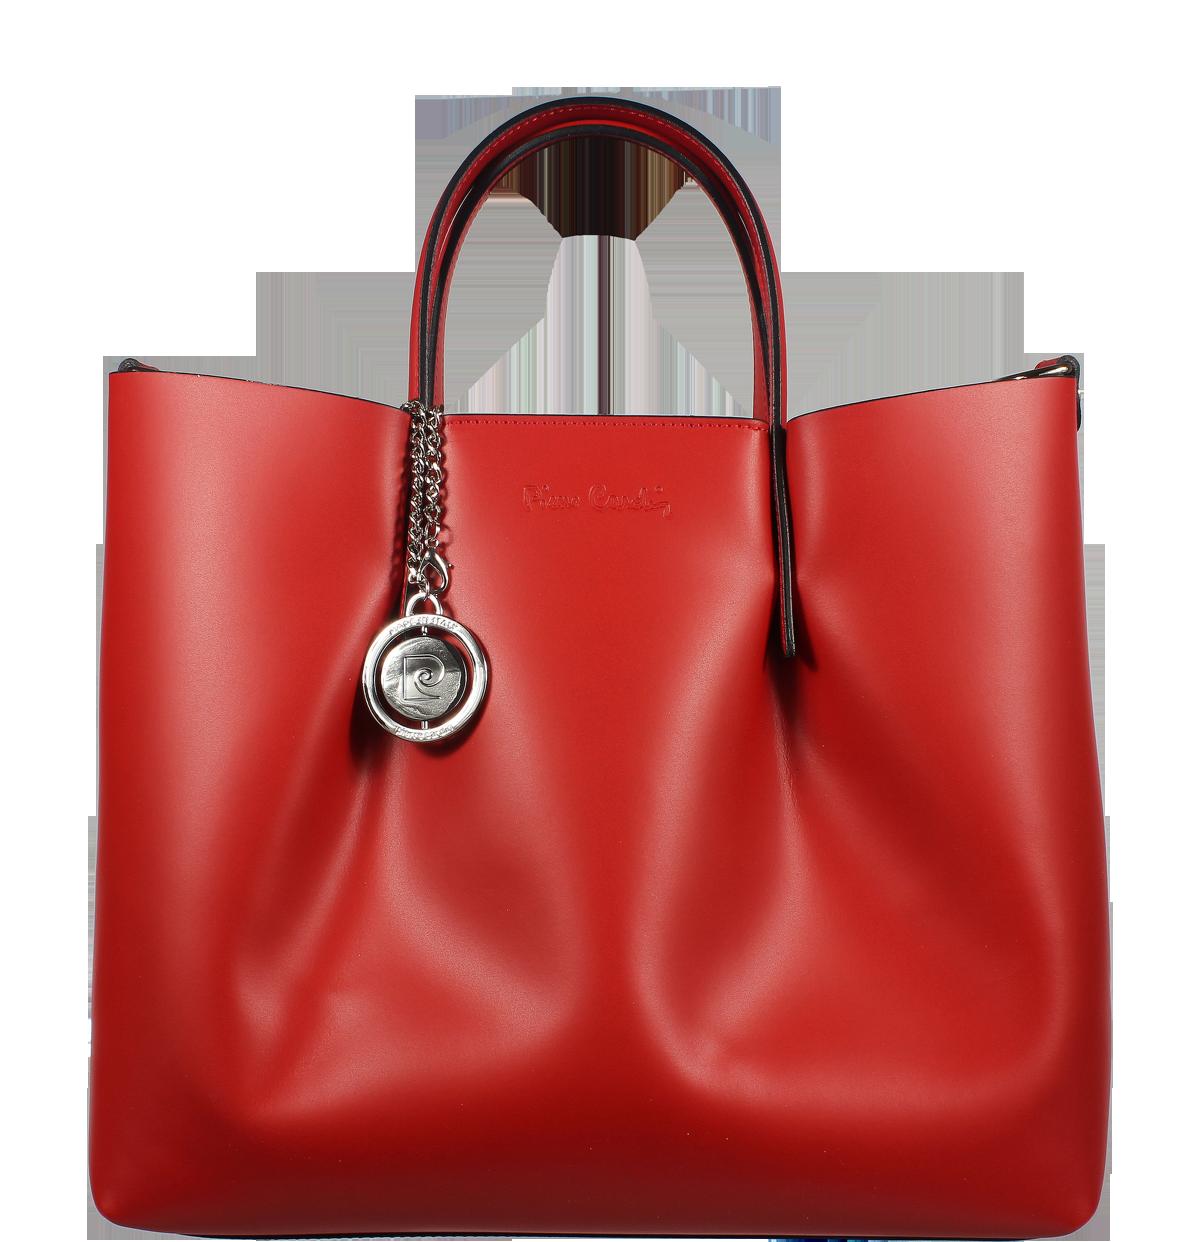 Červená kabelka Pierre Cardin 1518 Ruga Rosso Červená kabelka Pierre Cardin 1518 Ruga Rosso